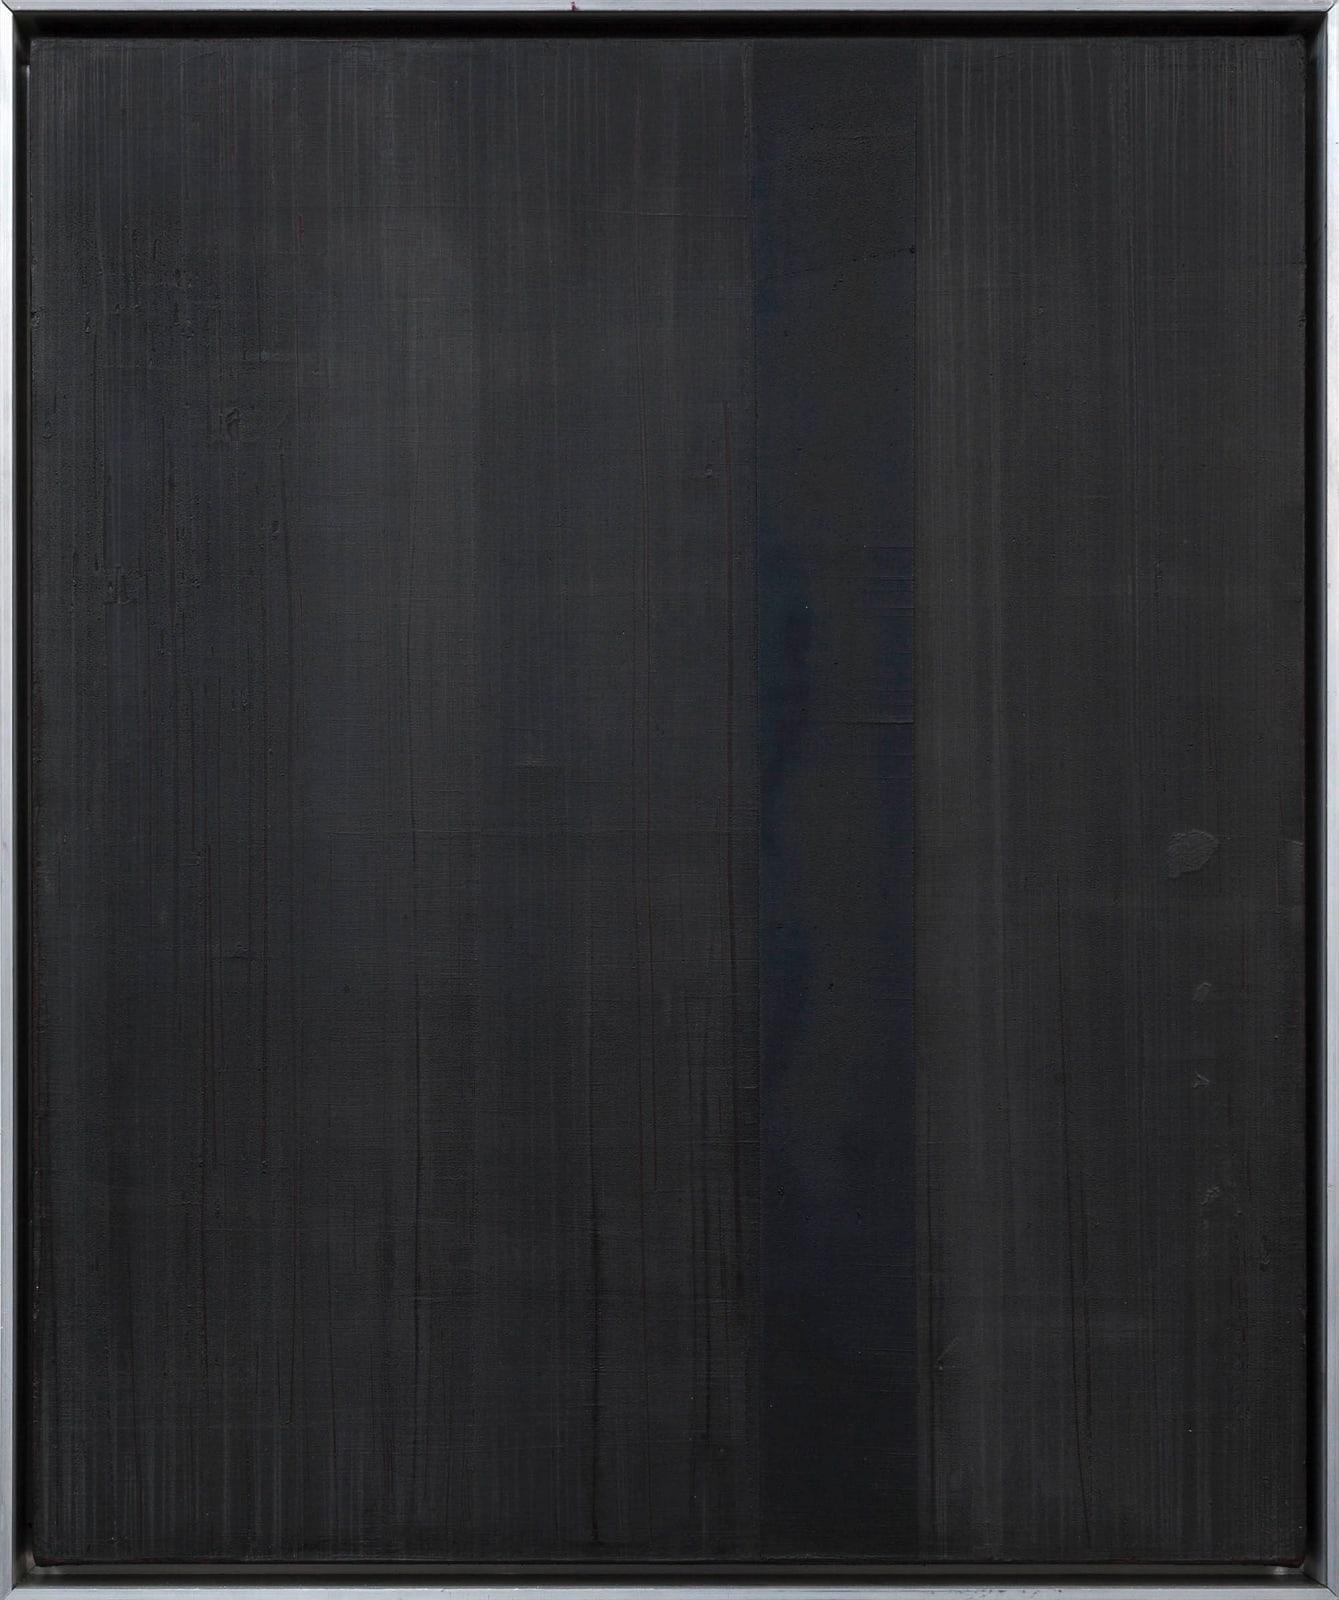 Untitled 2010-2018 Graphite on canvas 60 x 50 cm